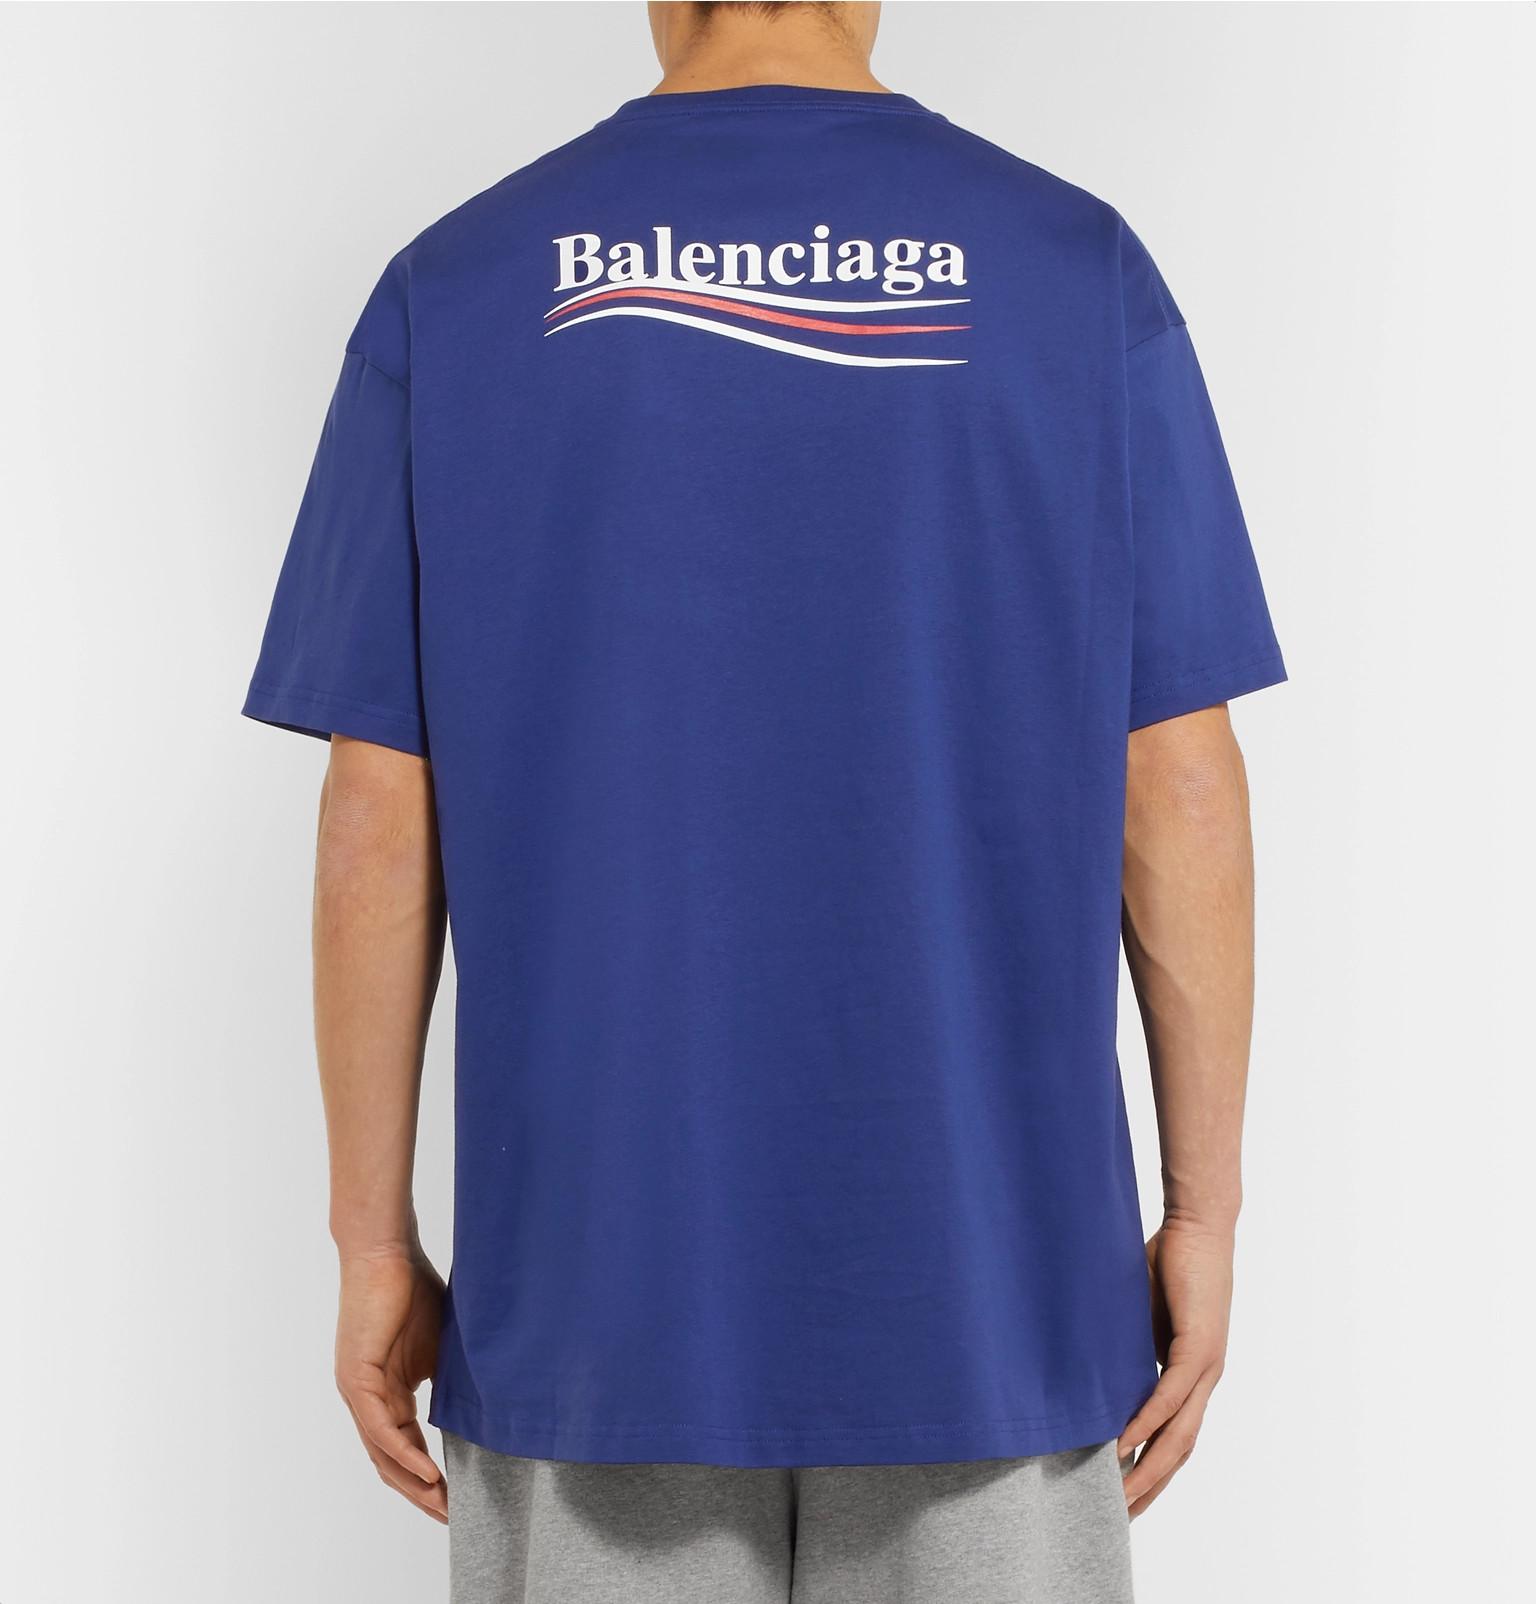 aec674b2ba3c Balenciaga - Printed Cotton-Jersey T-Shirt